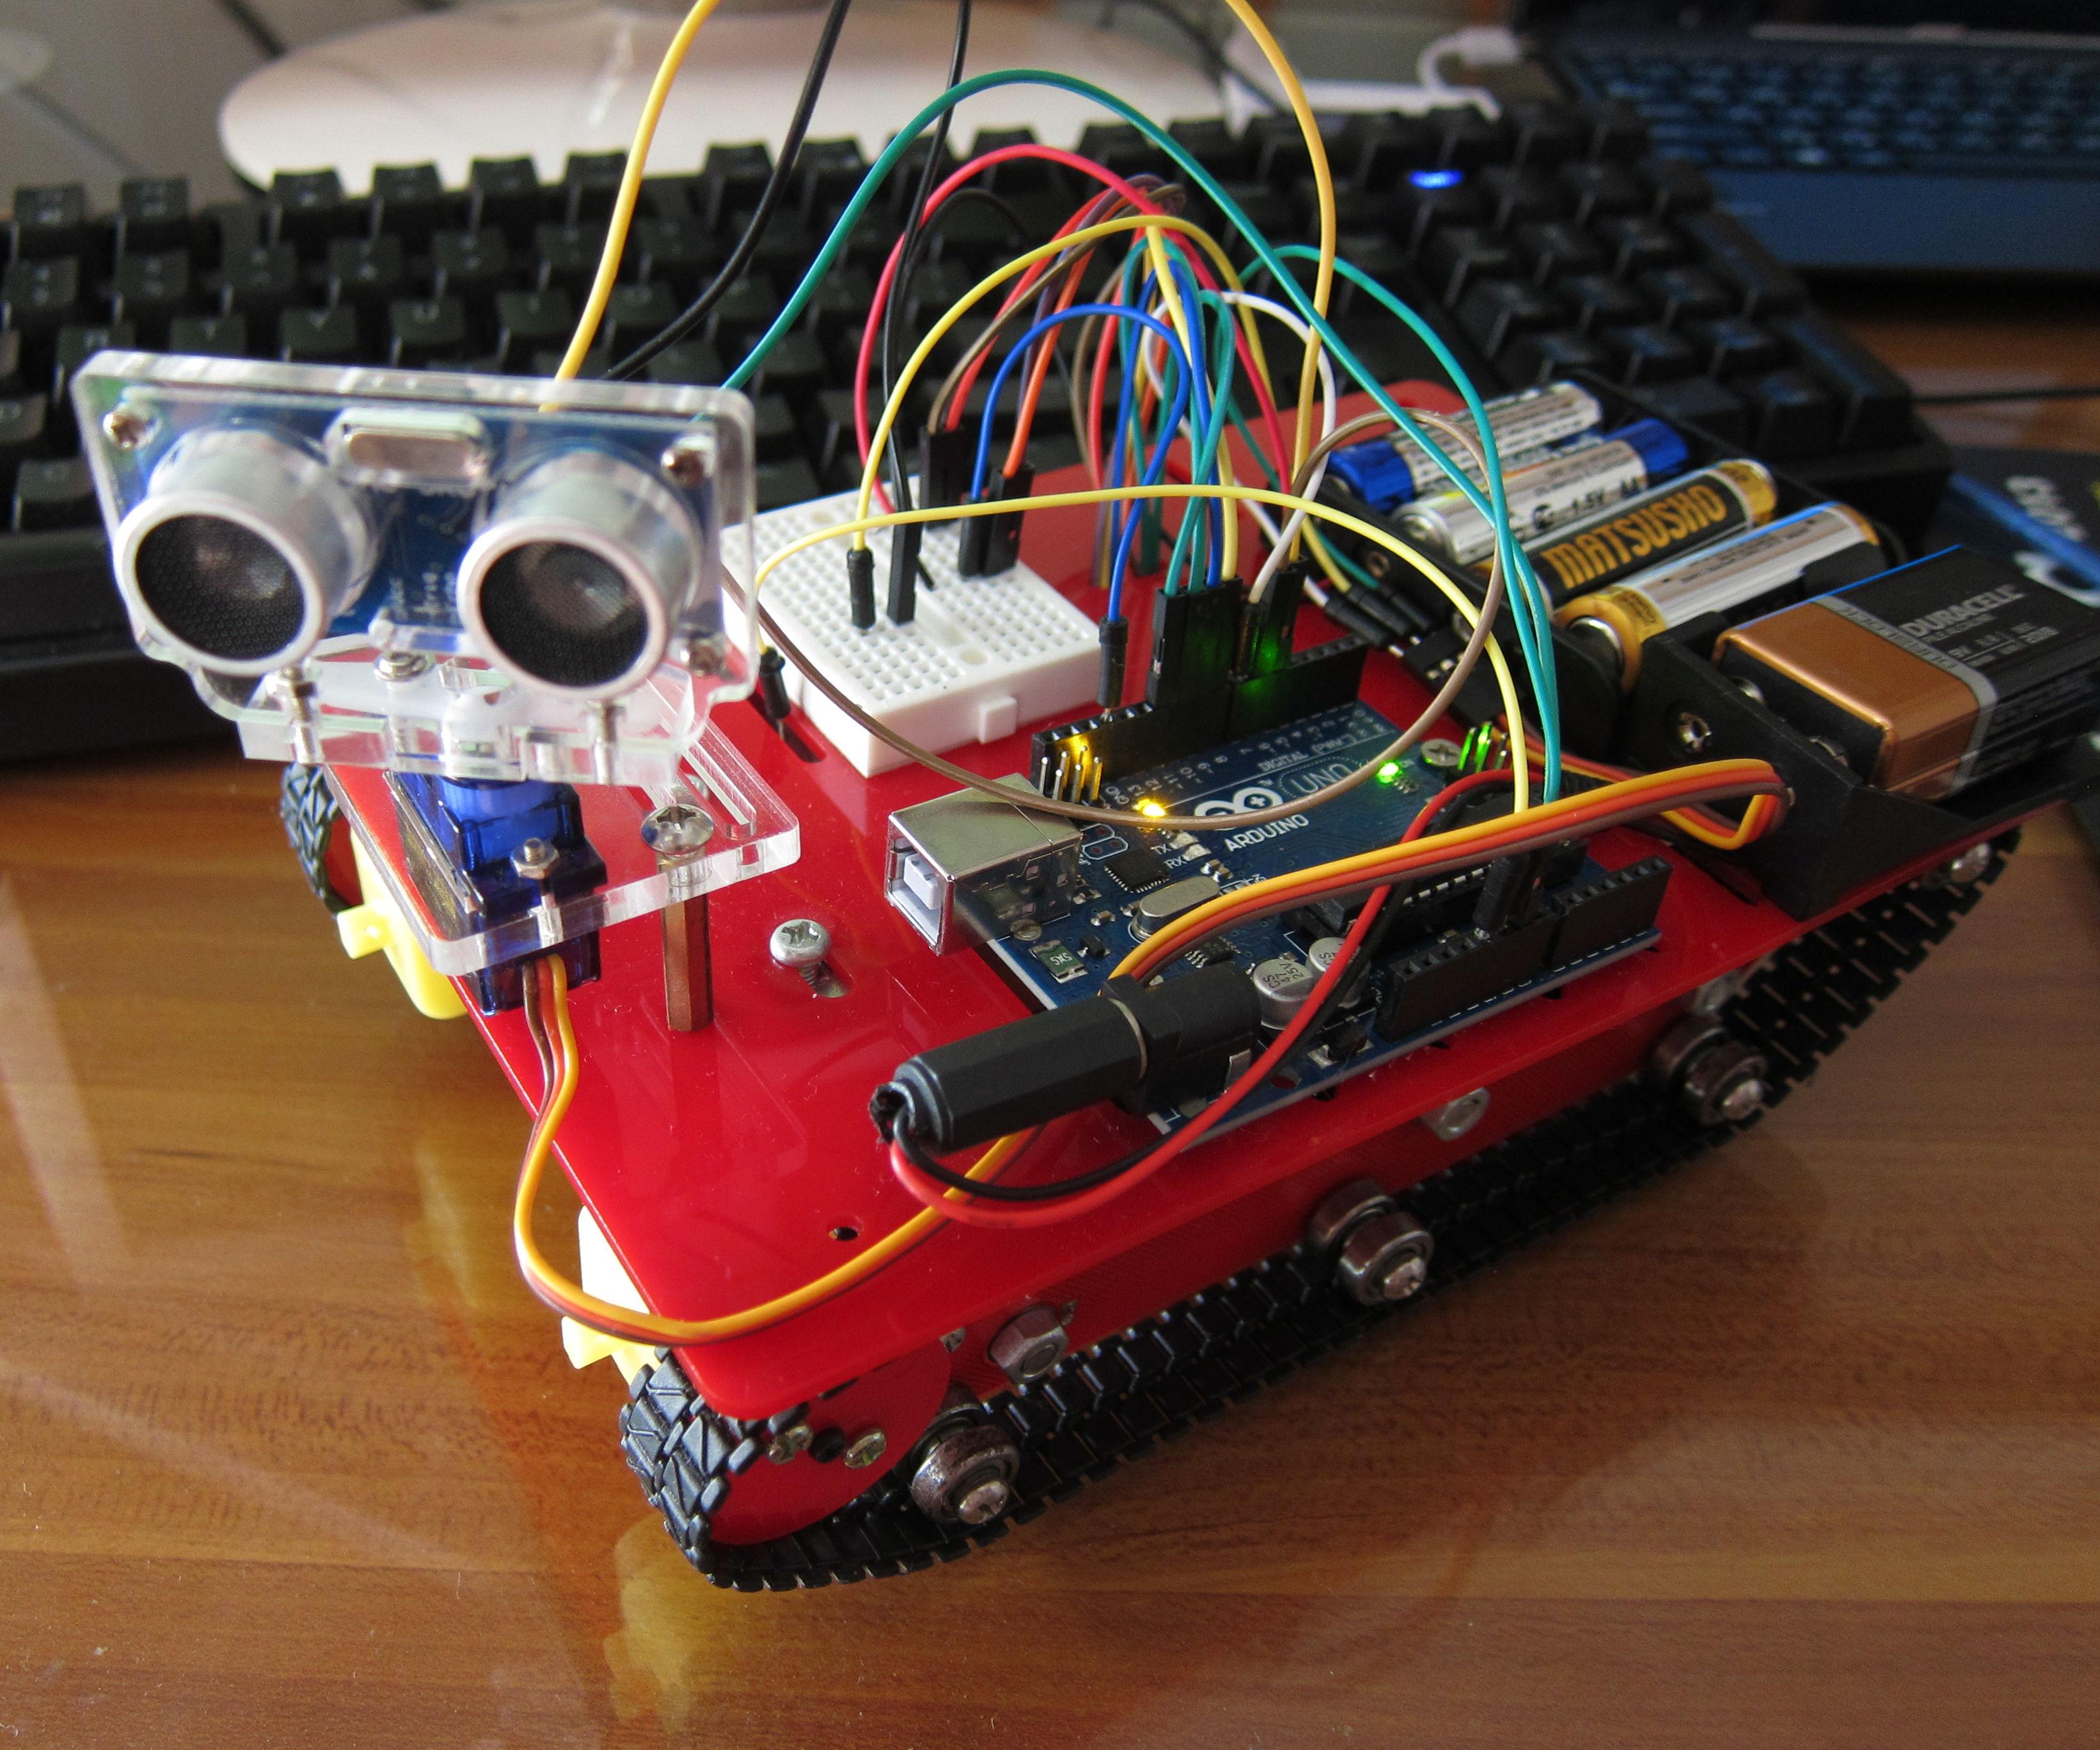 My Sixth Project: Smart Tank Chassis with Ultrasonic Sensor